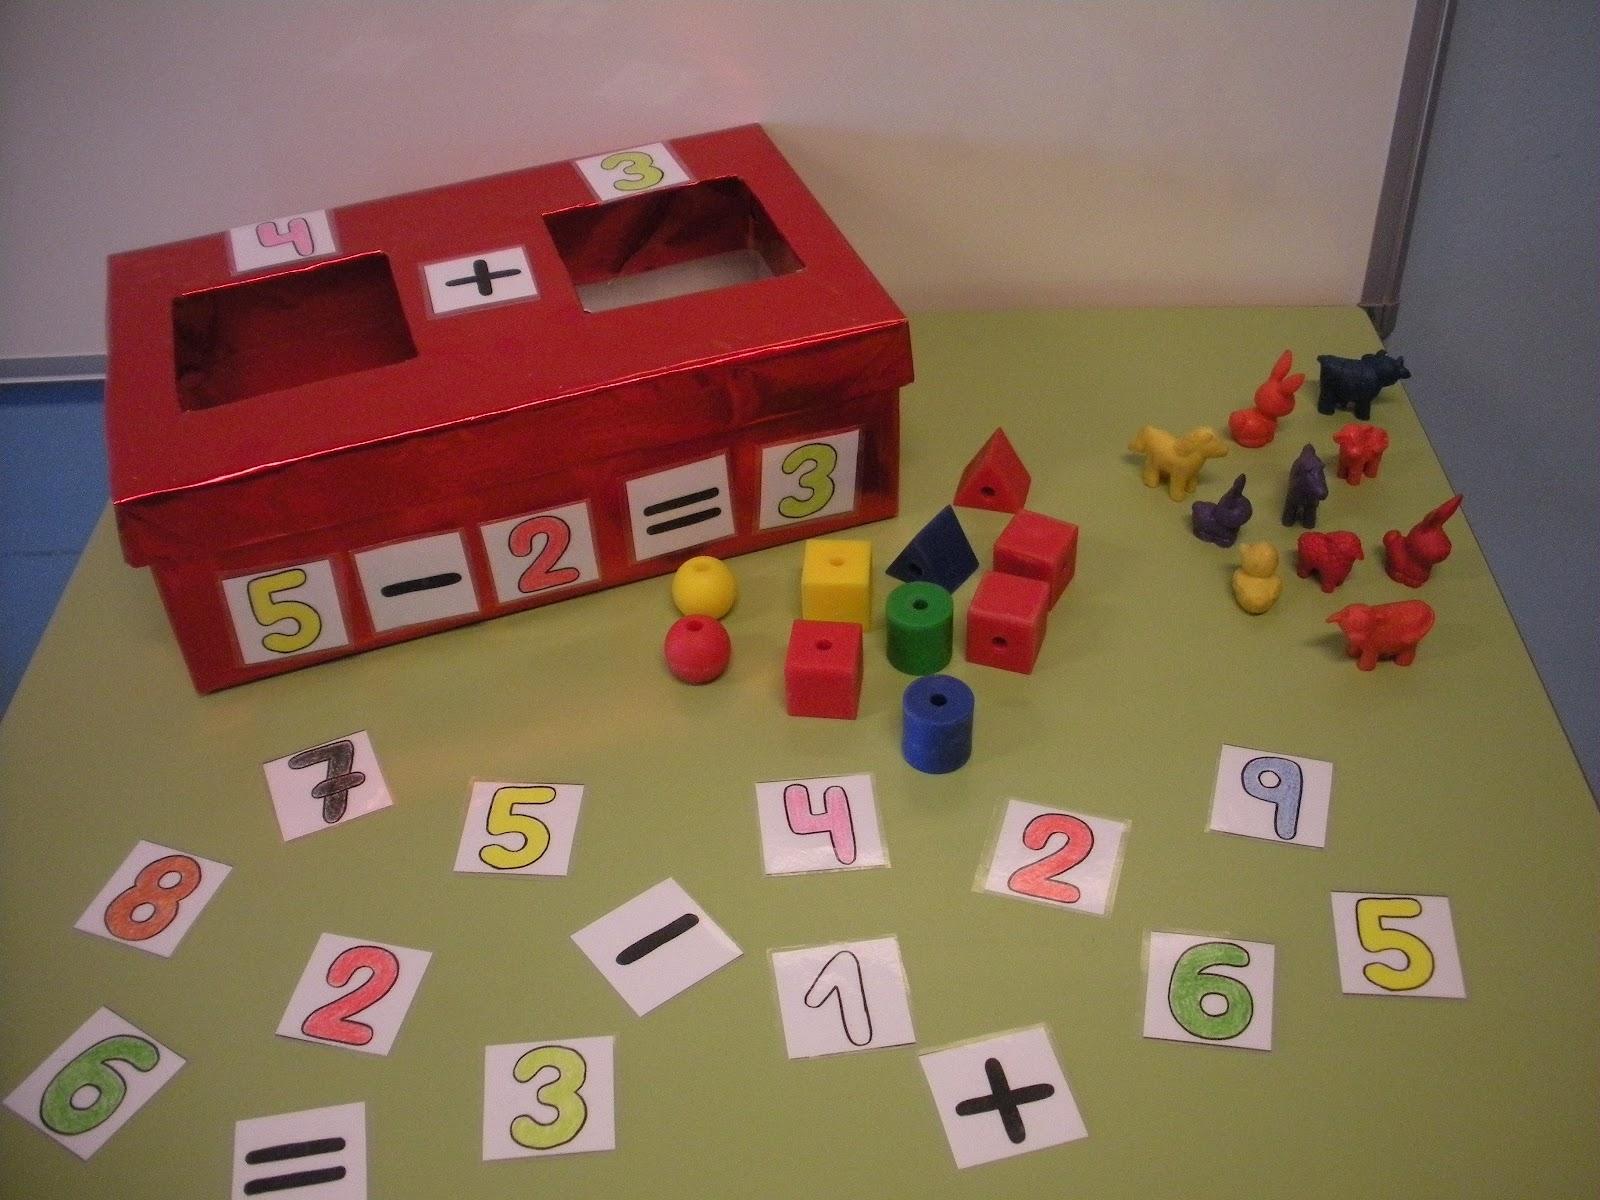 El rinconcito de infantil la caja de las sumas for Caja de colores jardin infantil